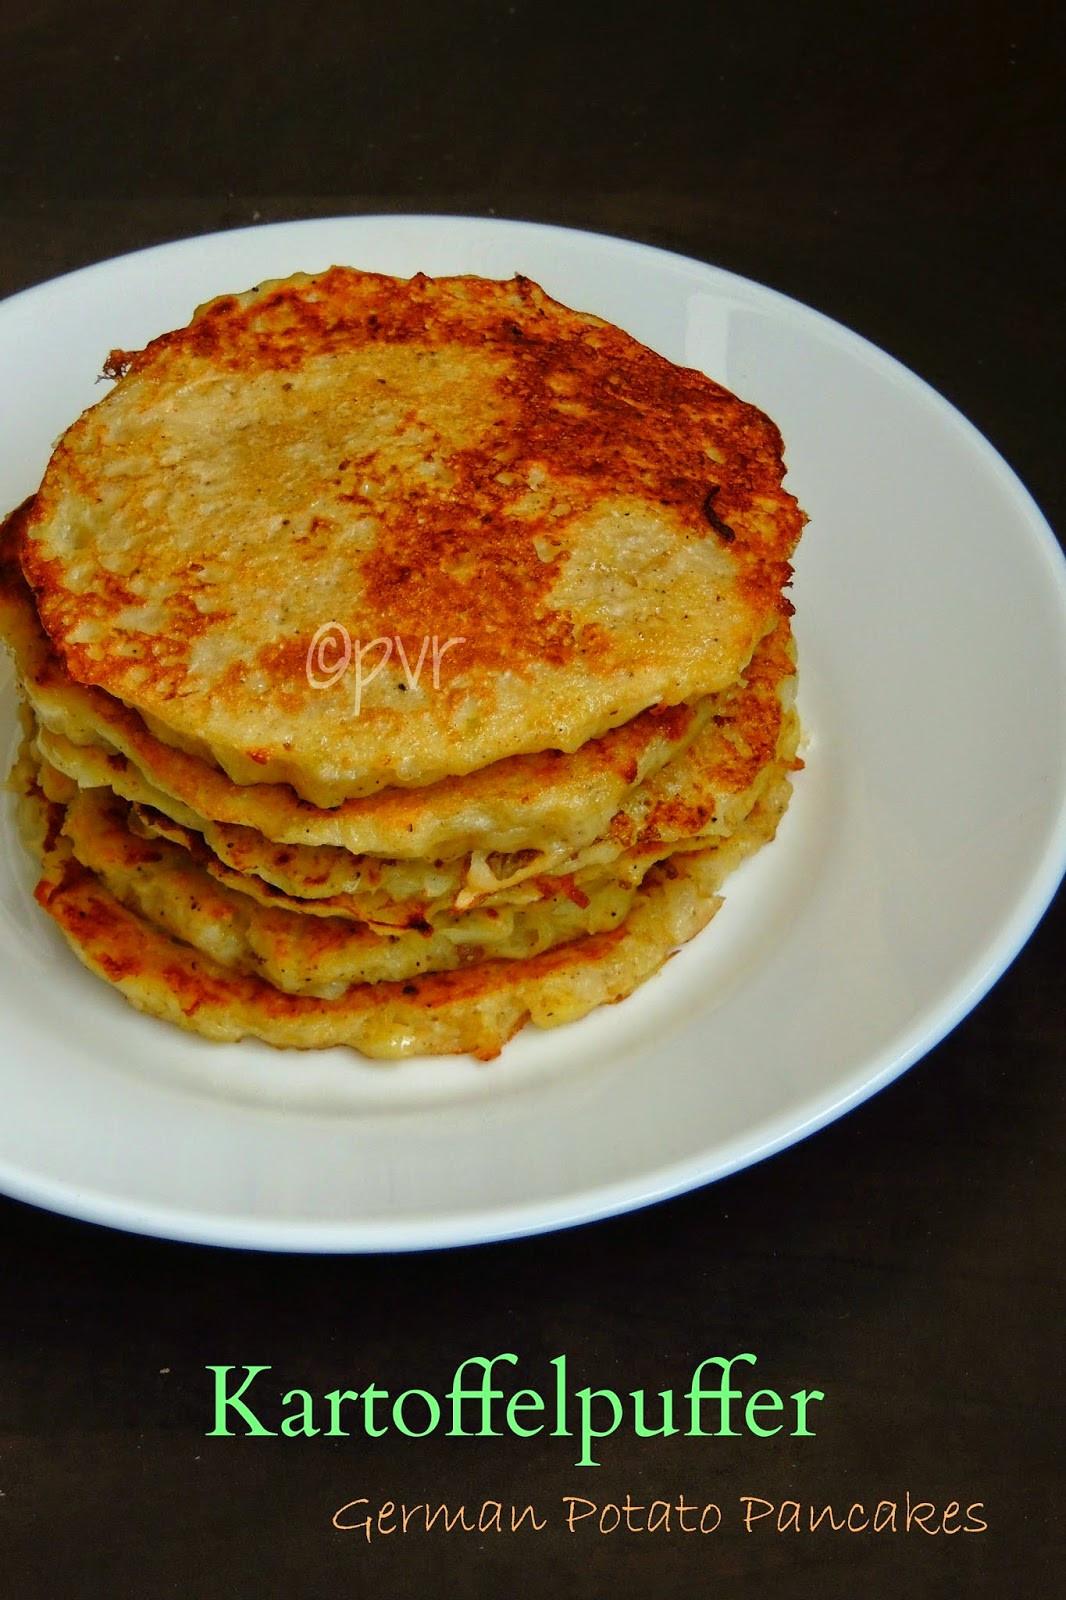 Potato Pancakes German  Priya s Versatile Recipes Kartoffelpuffer German Potato